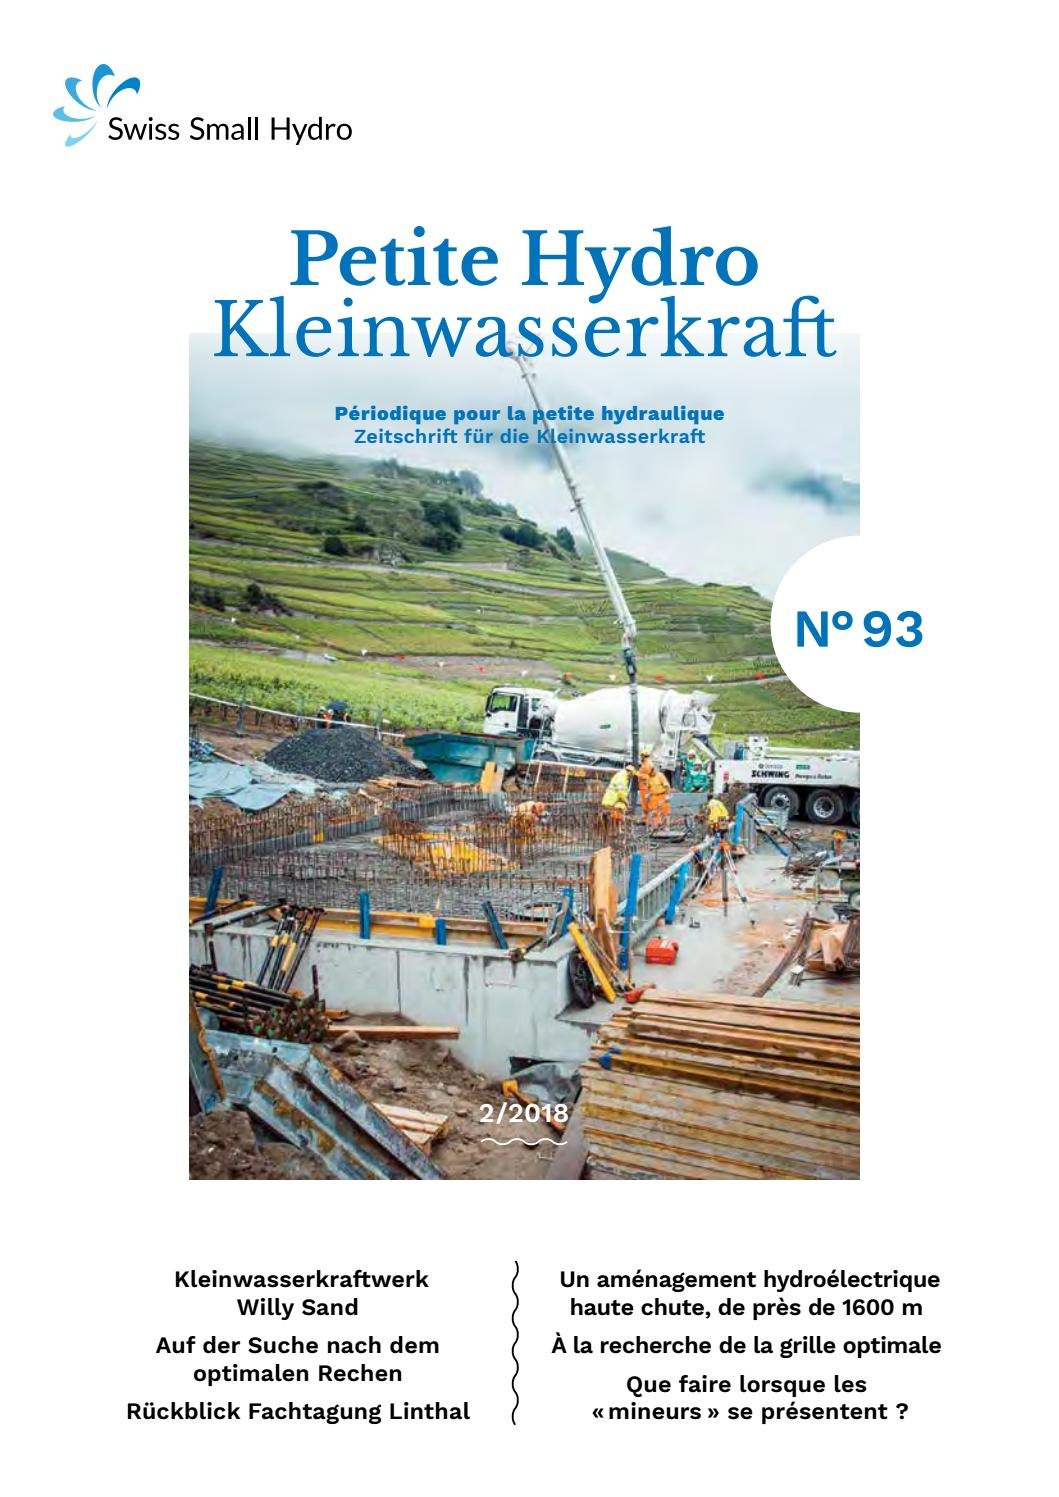 Kleinwasserkraft Petite Hydro N 93 By Swissmallhydro Issuu